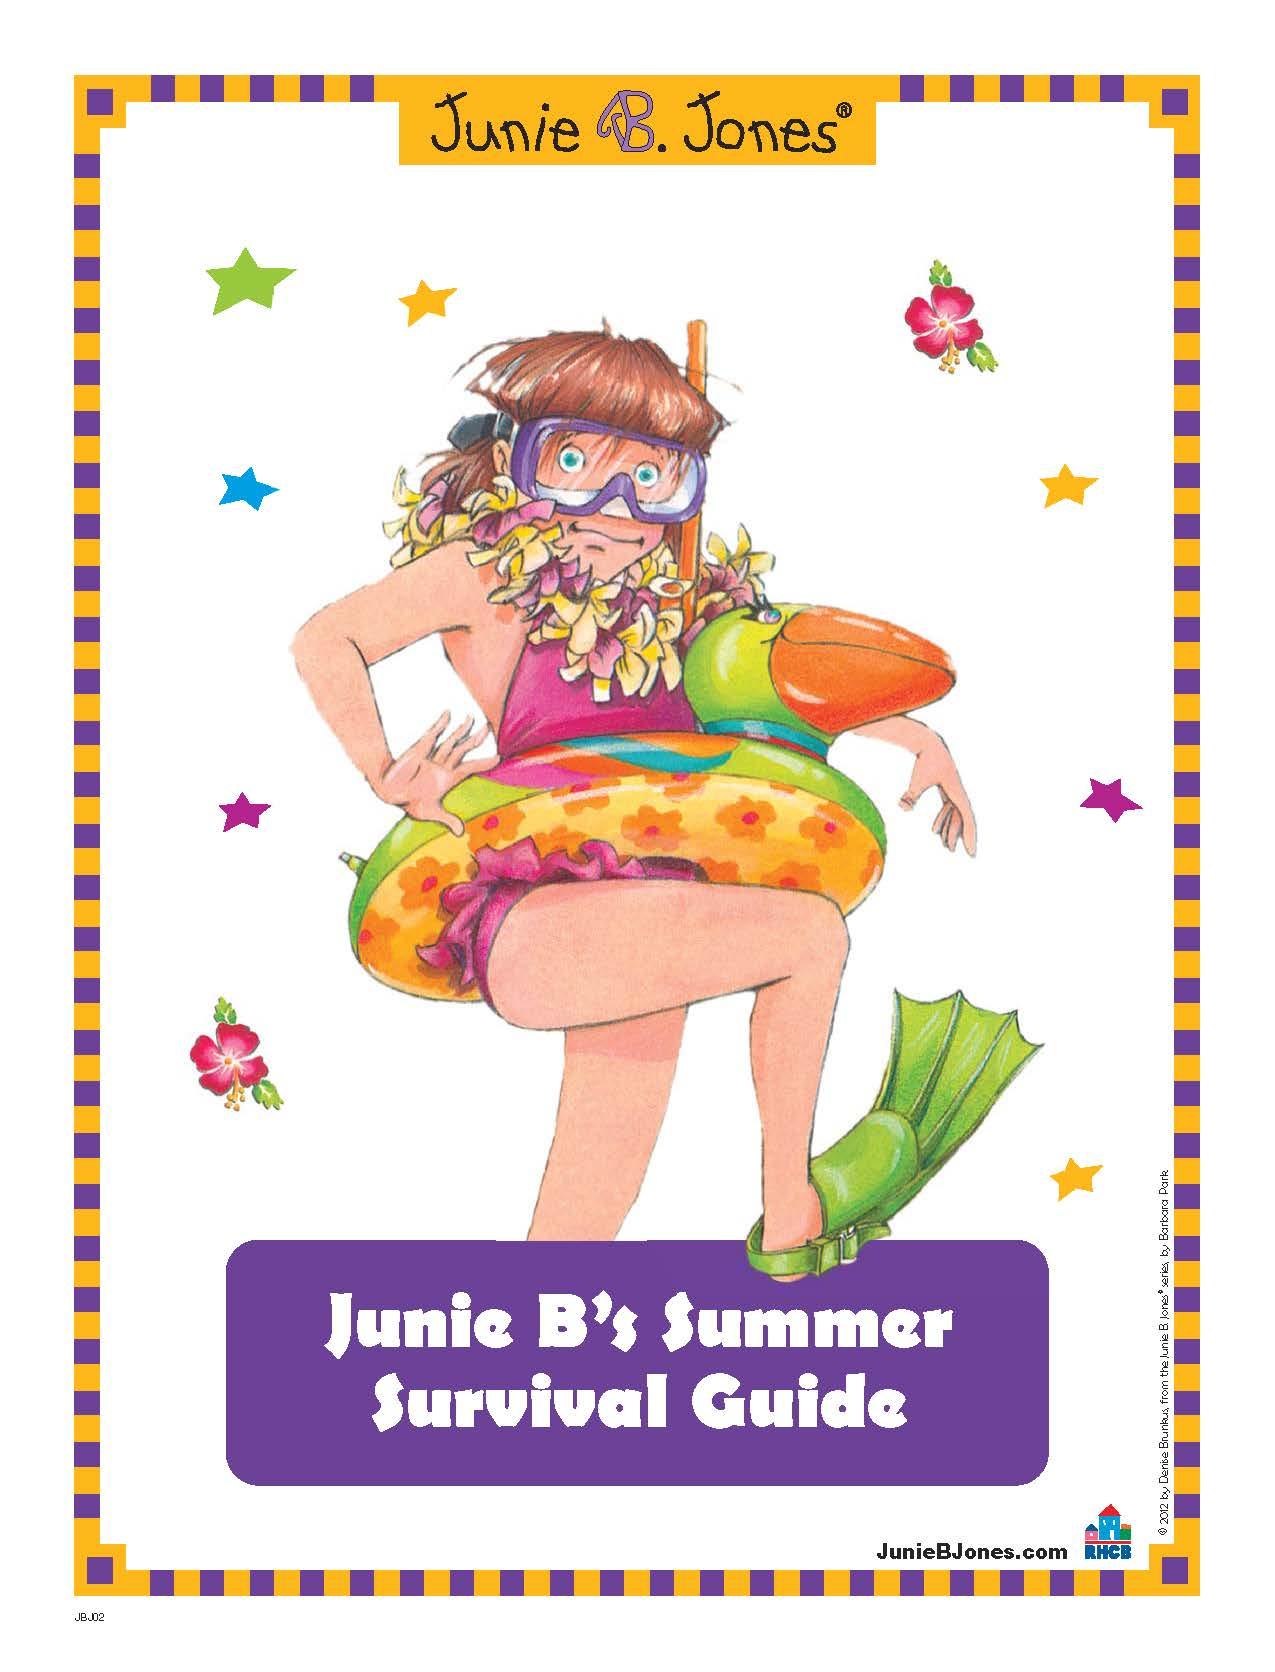 Junie B.'s Summer Survival Guide Activity Kit